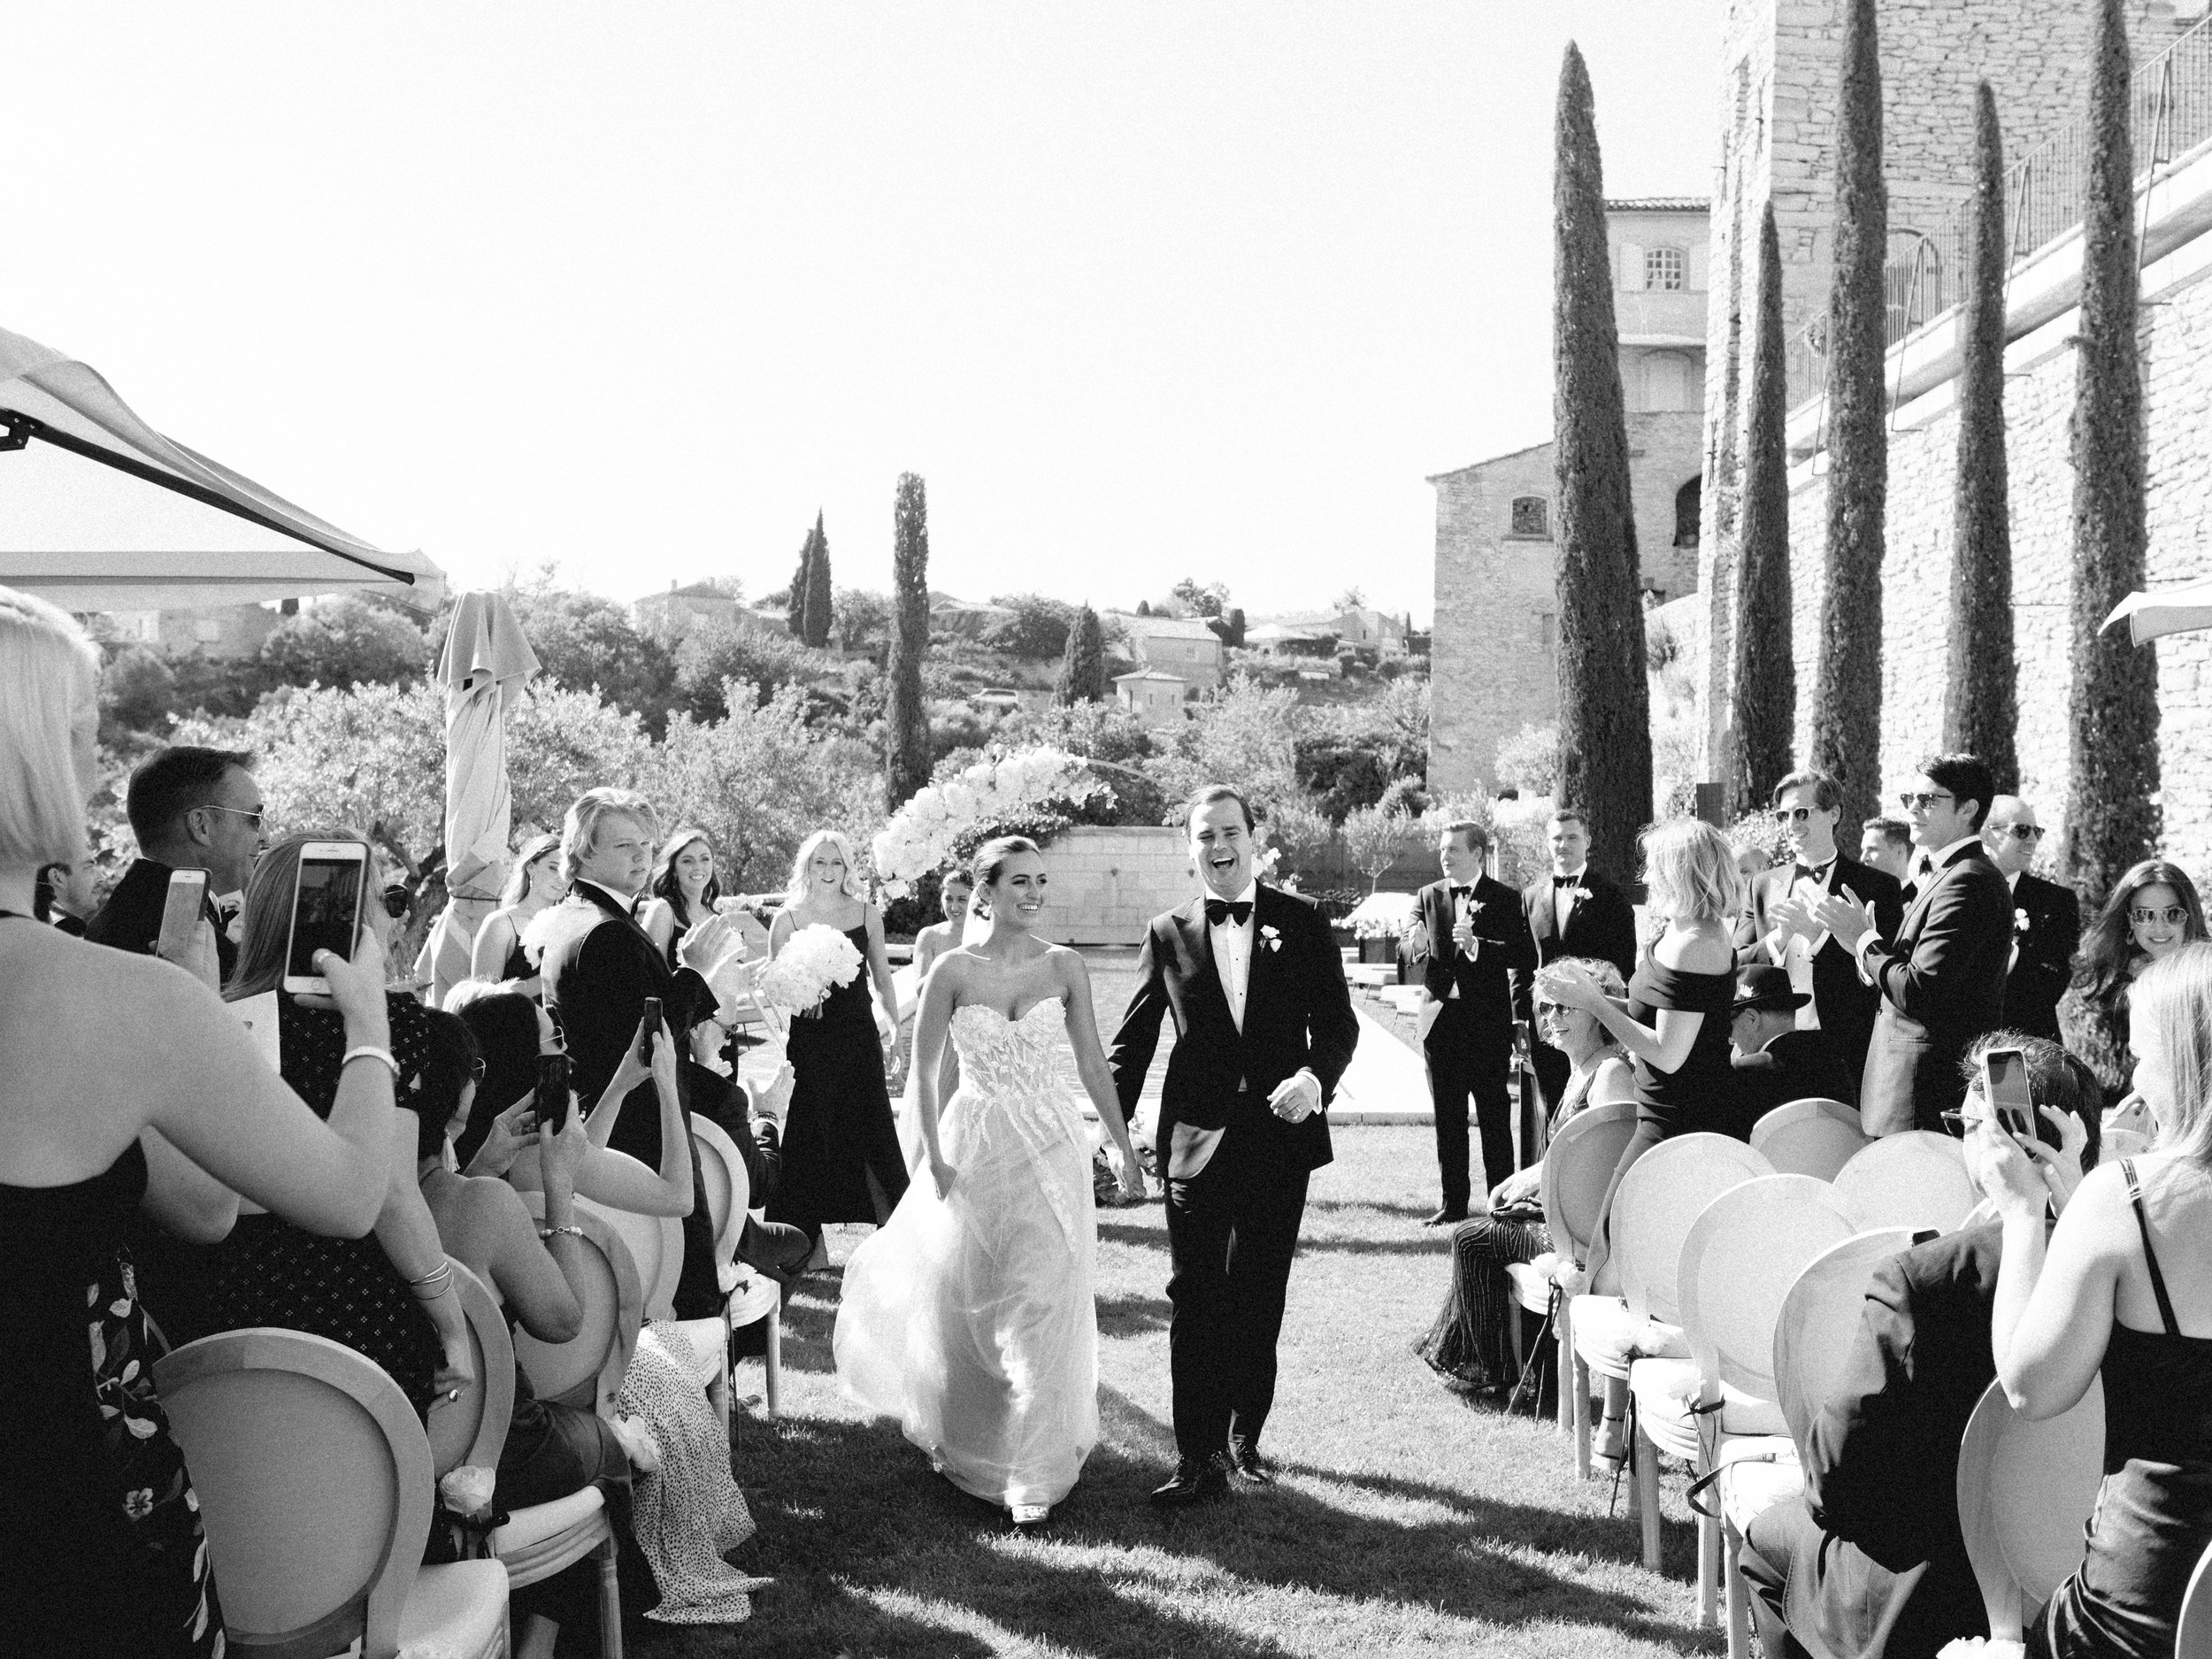 bastide_de_gordes_provence_wedding_(c)_rory-wylie-33.jpg